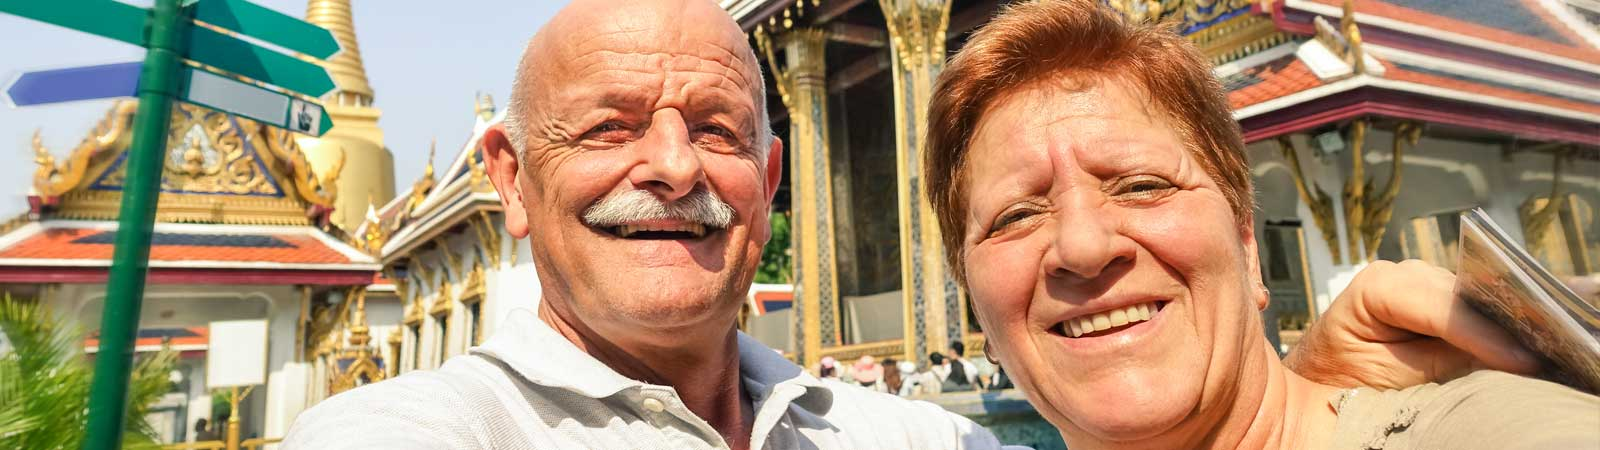 Senior couple smiling at the camera